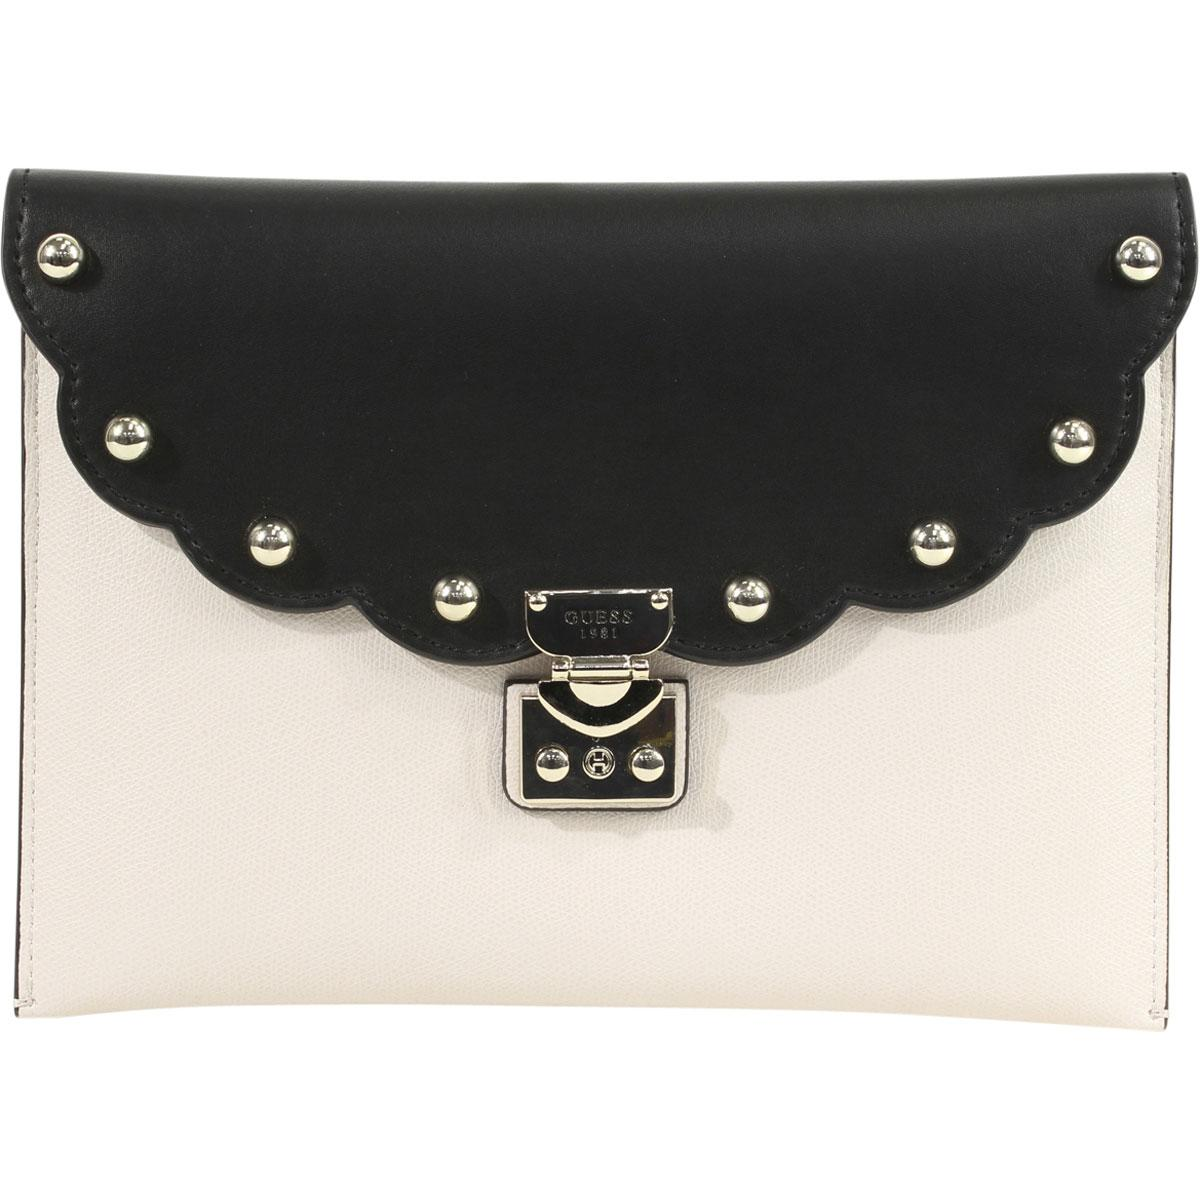 ee7e1d6cfd Guess Women s Fall In Love Mini Crossbody Clutch Handbag